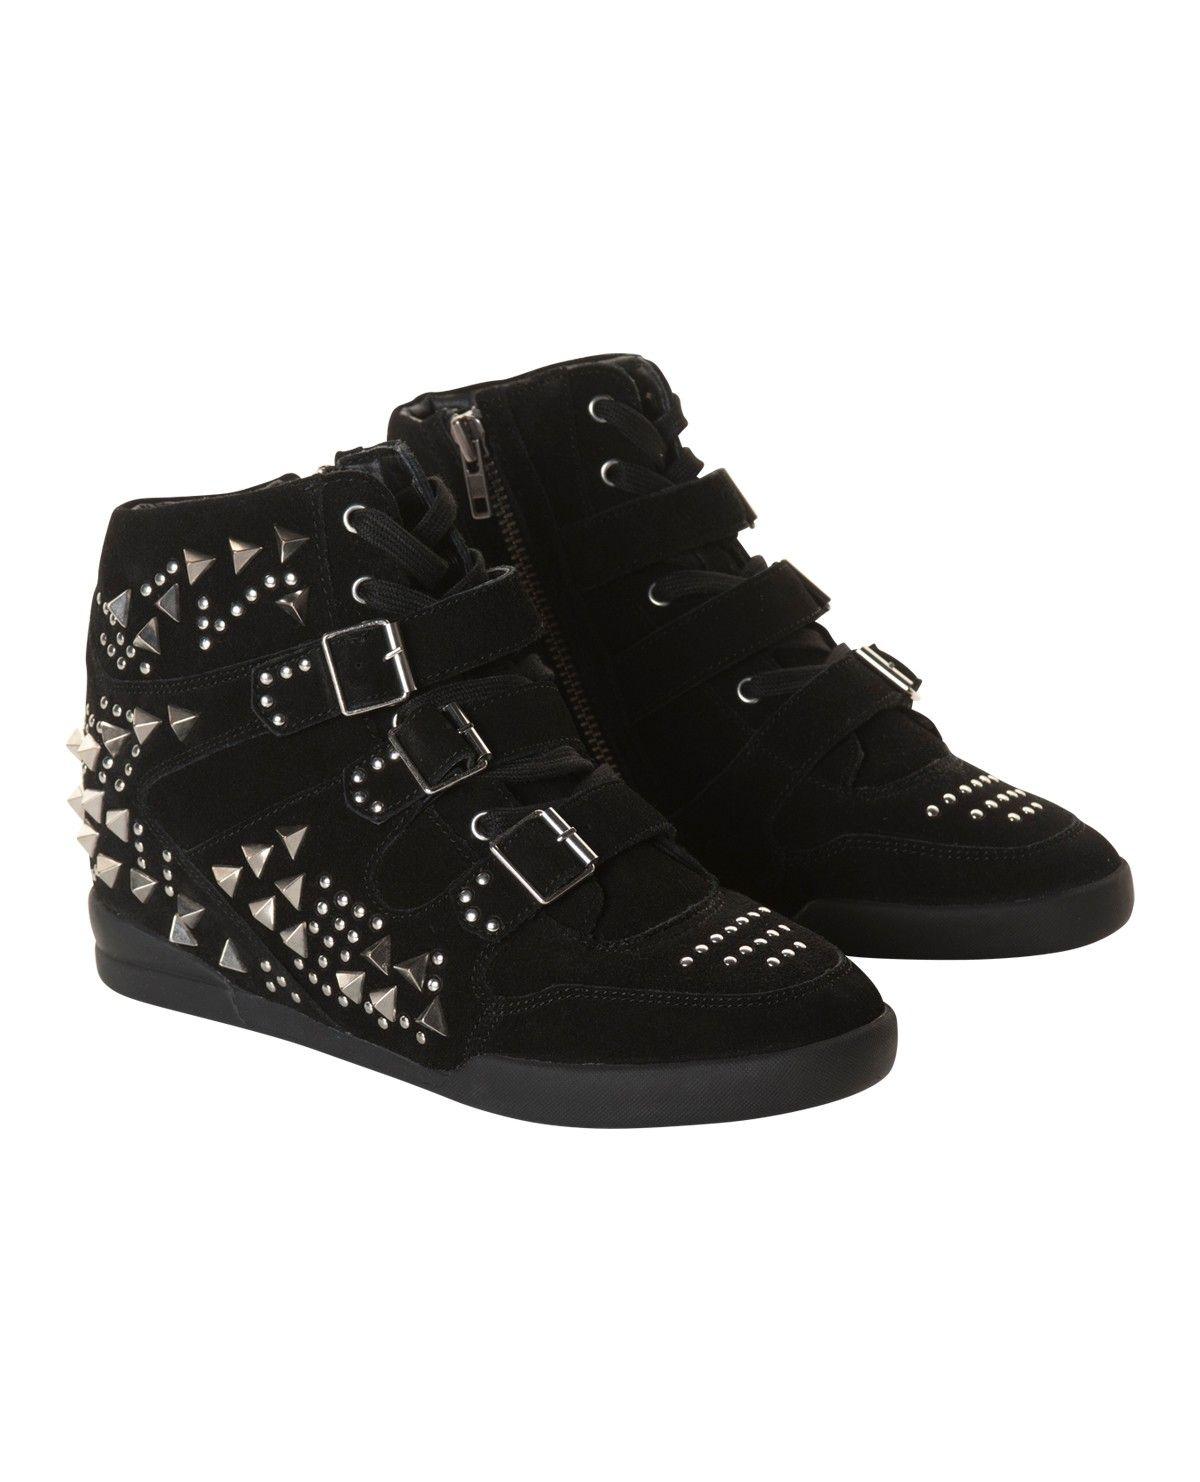 De Femme Bleu Kawaii Noires Ash Dansenoir Chaussures 6qAIaq